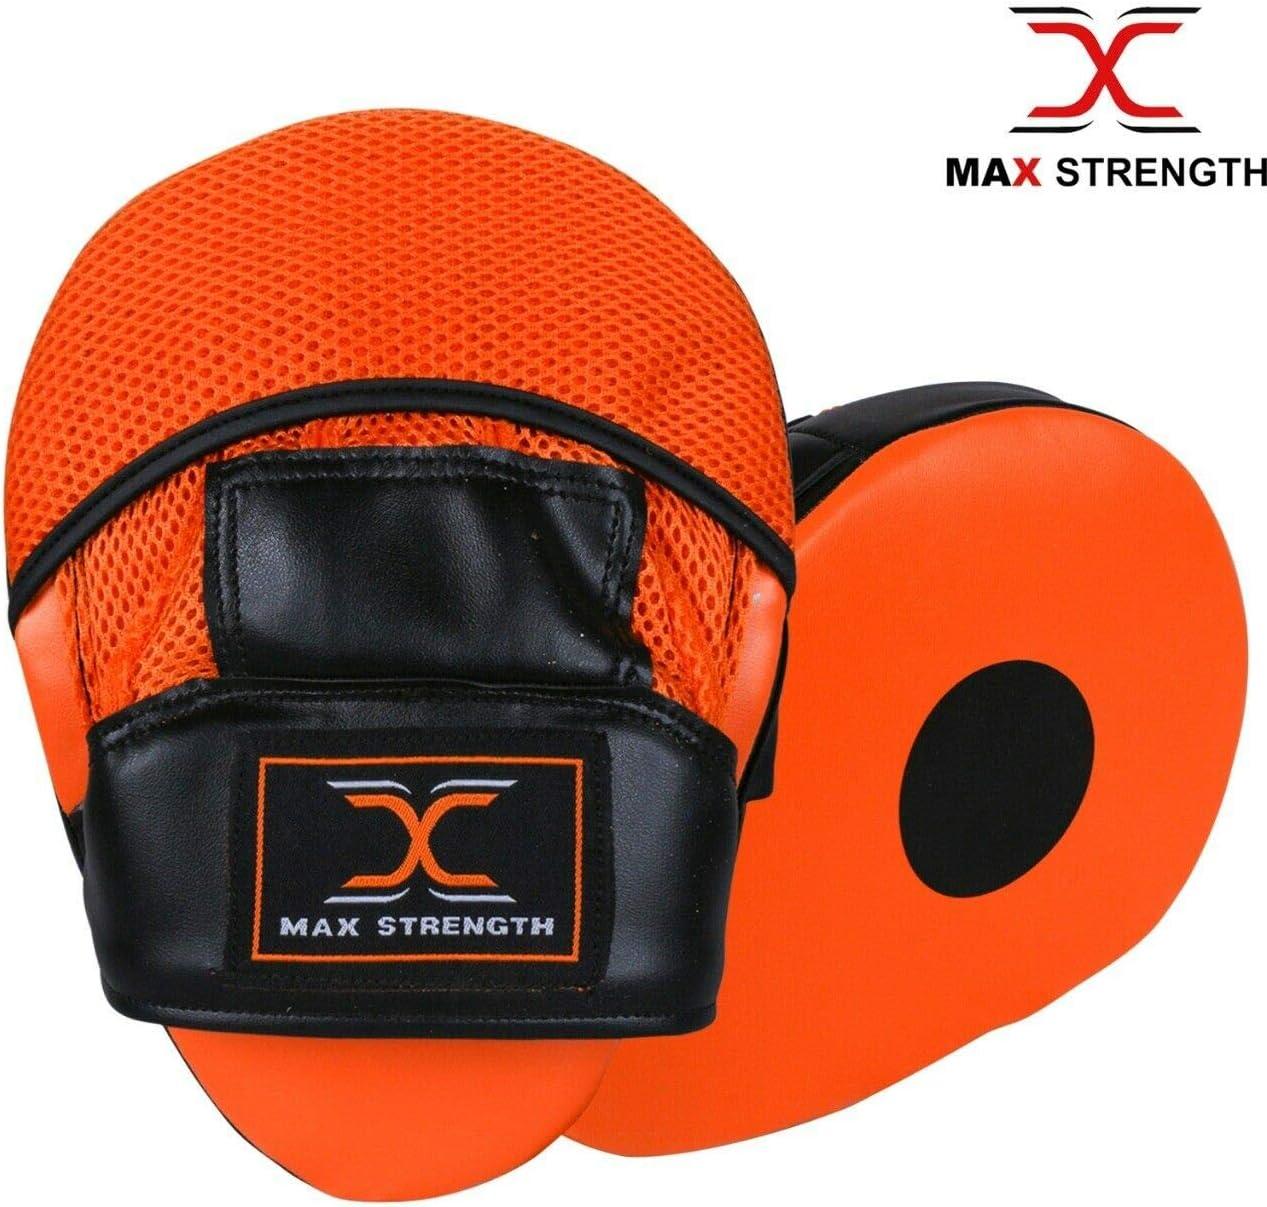 Black /& Orange, 8oz Max Strength Focus Pads Jab /& Hook Boxing Sparring Punching Gloves MMA Mitts Set